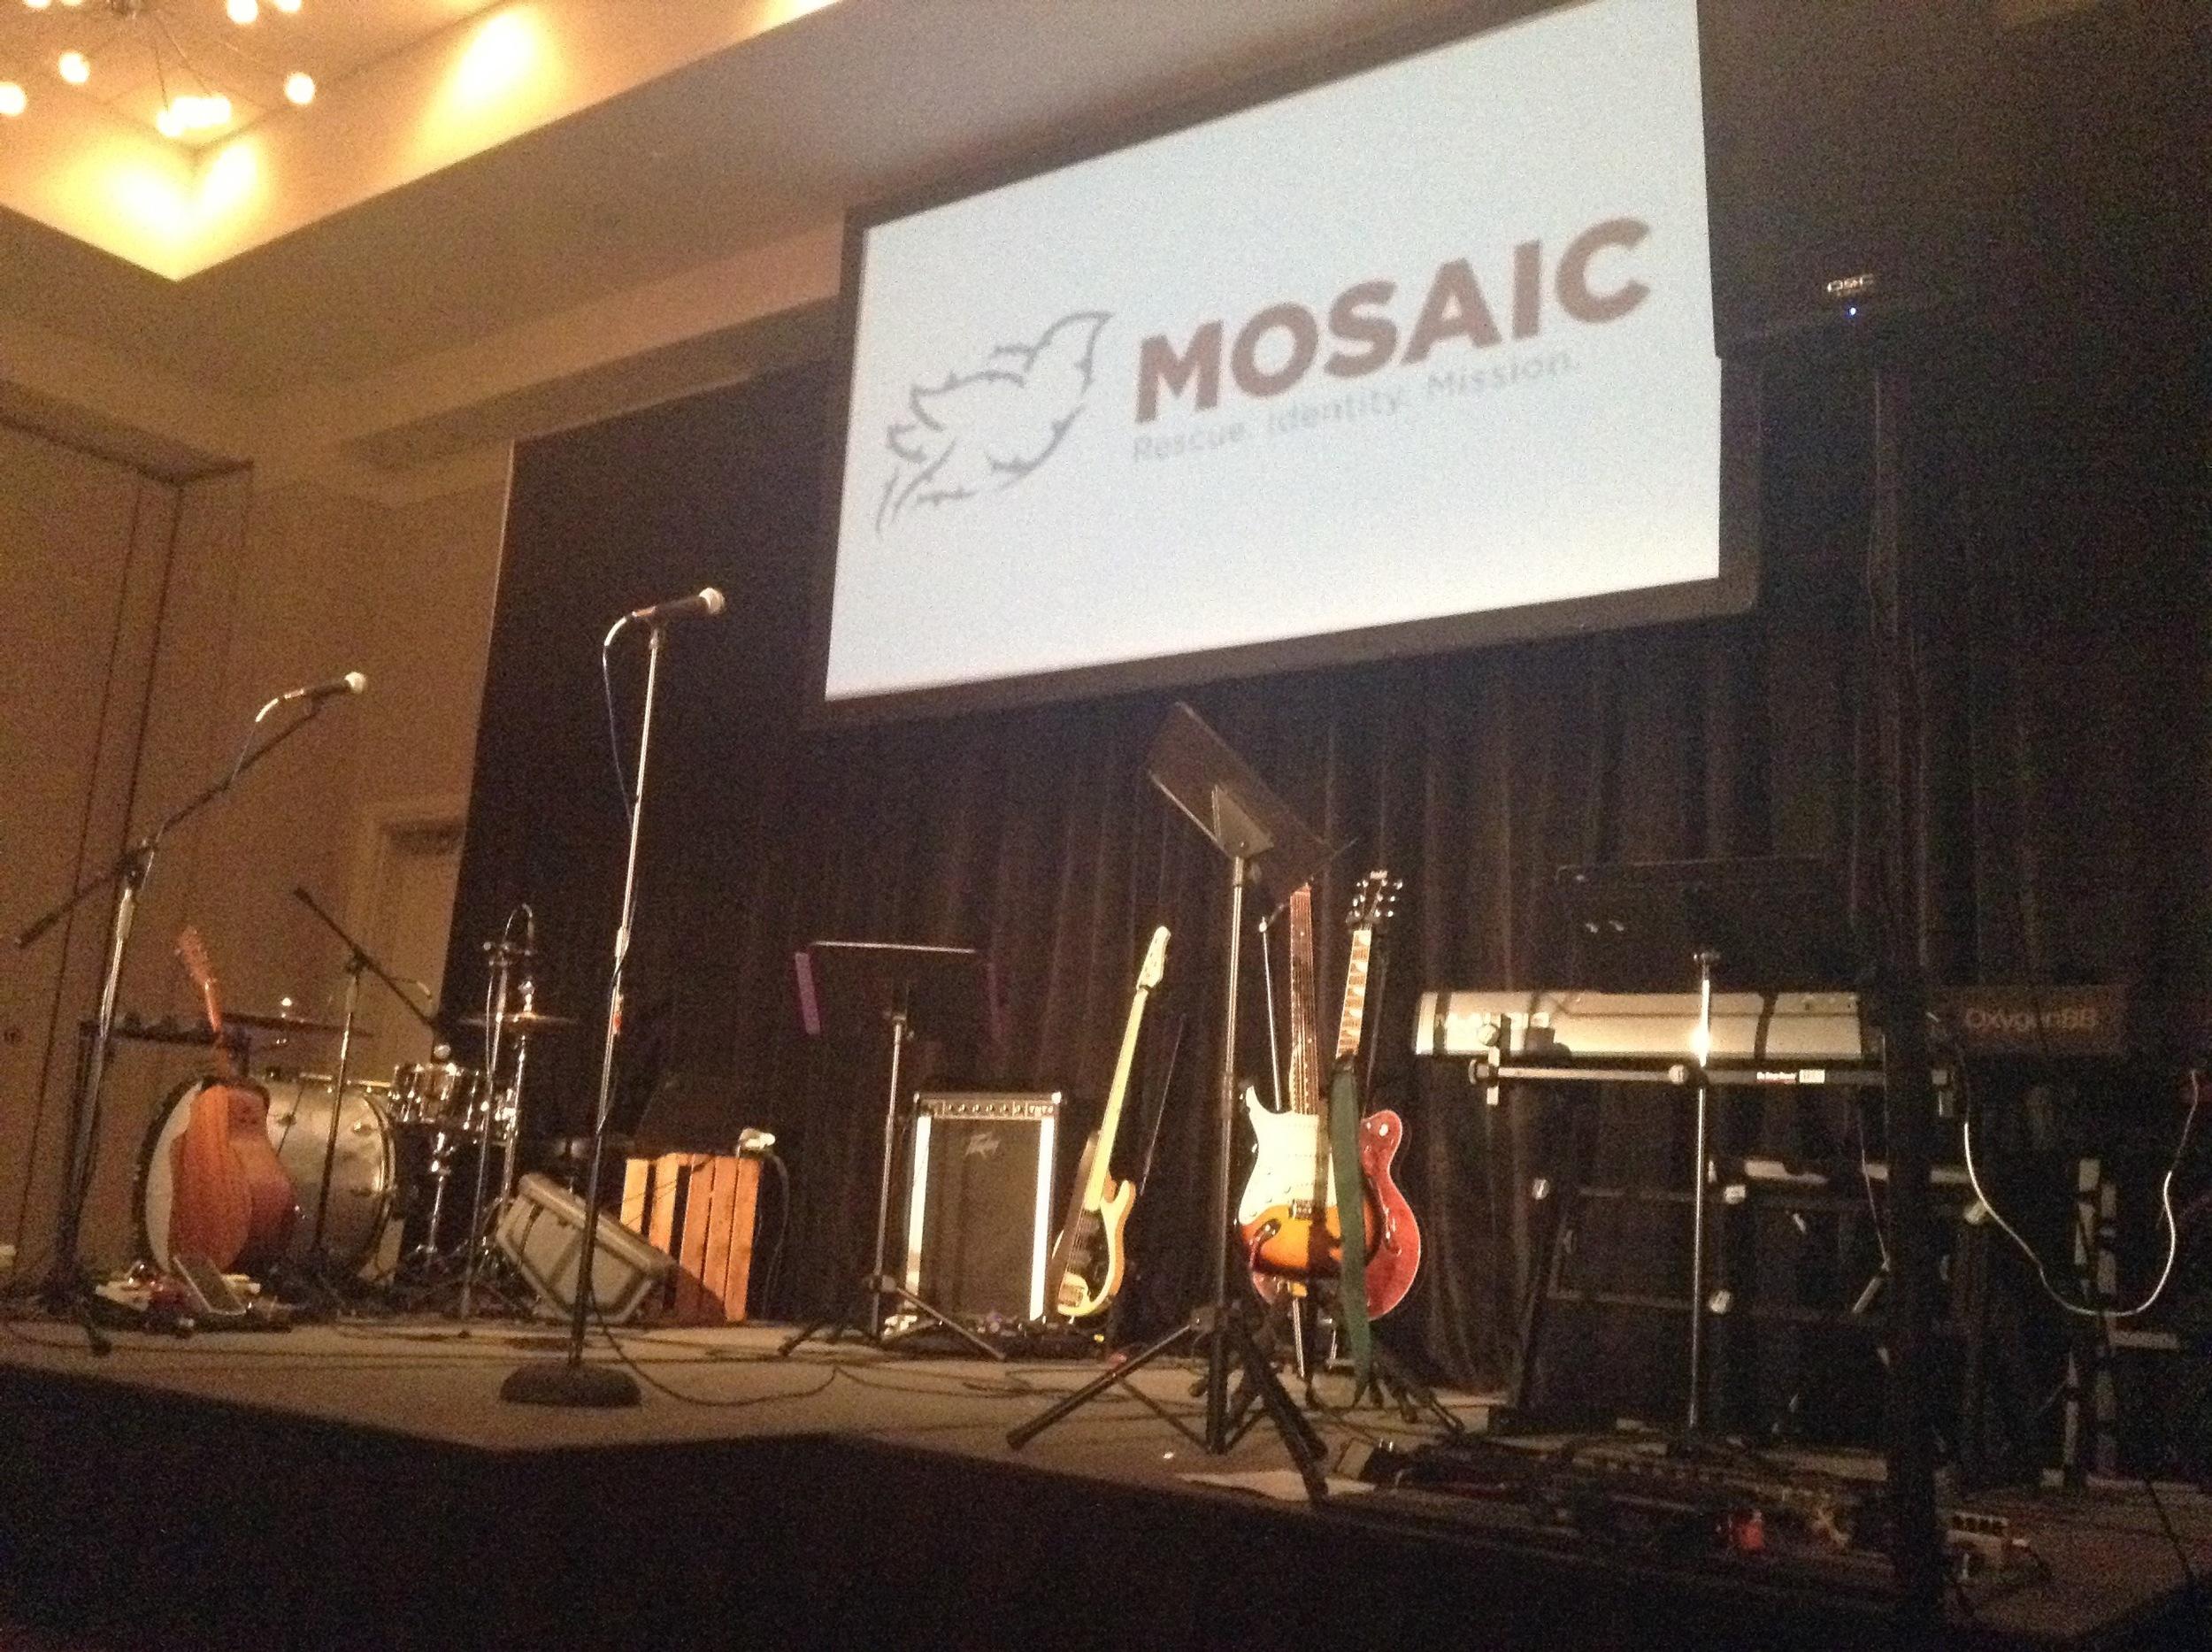 Mosaic Church's Walt Disney World Campus